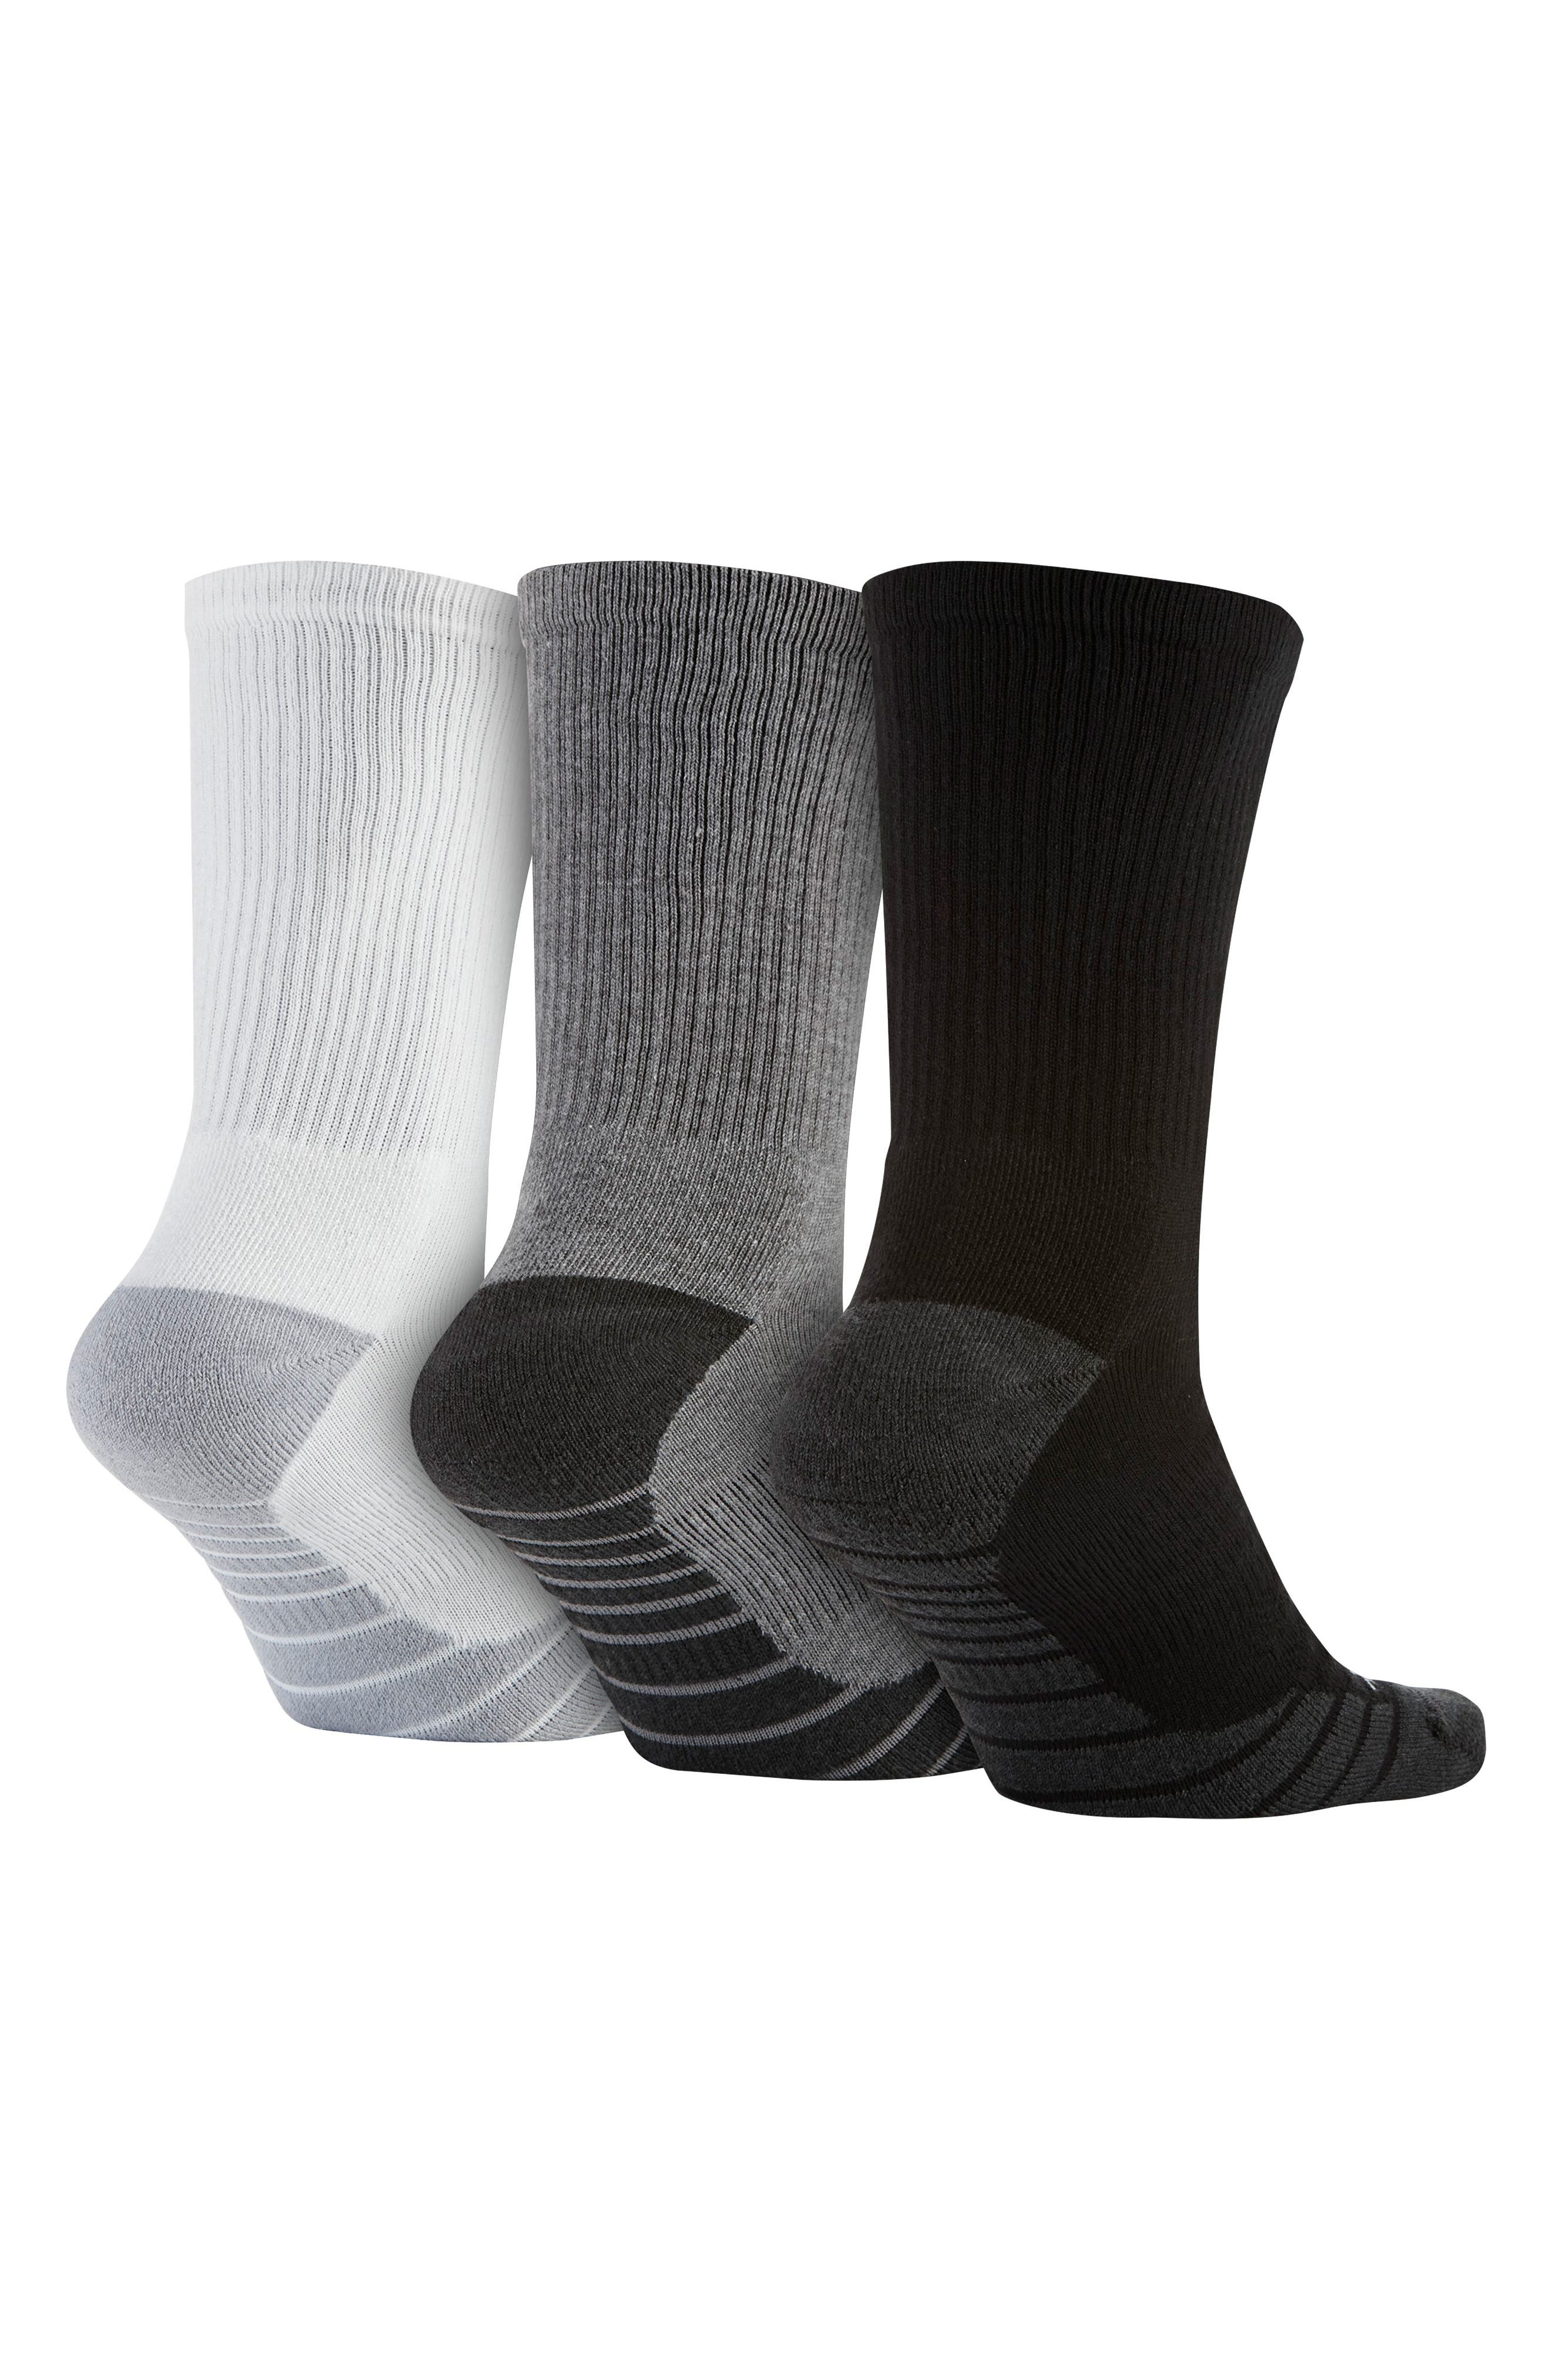 NIKE, Everyday Max Cushion 3-Pack Crew Socks, Alternate thumbnail 2, color, BLACK/ WHITE